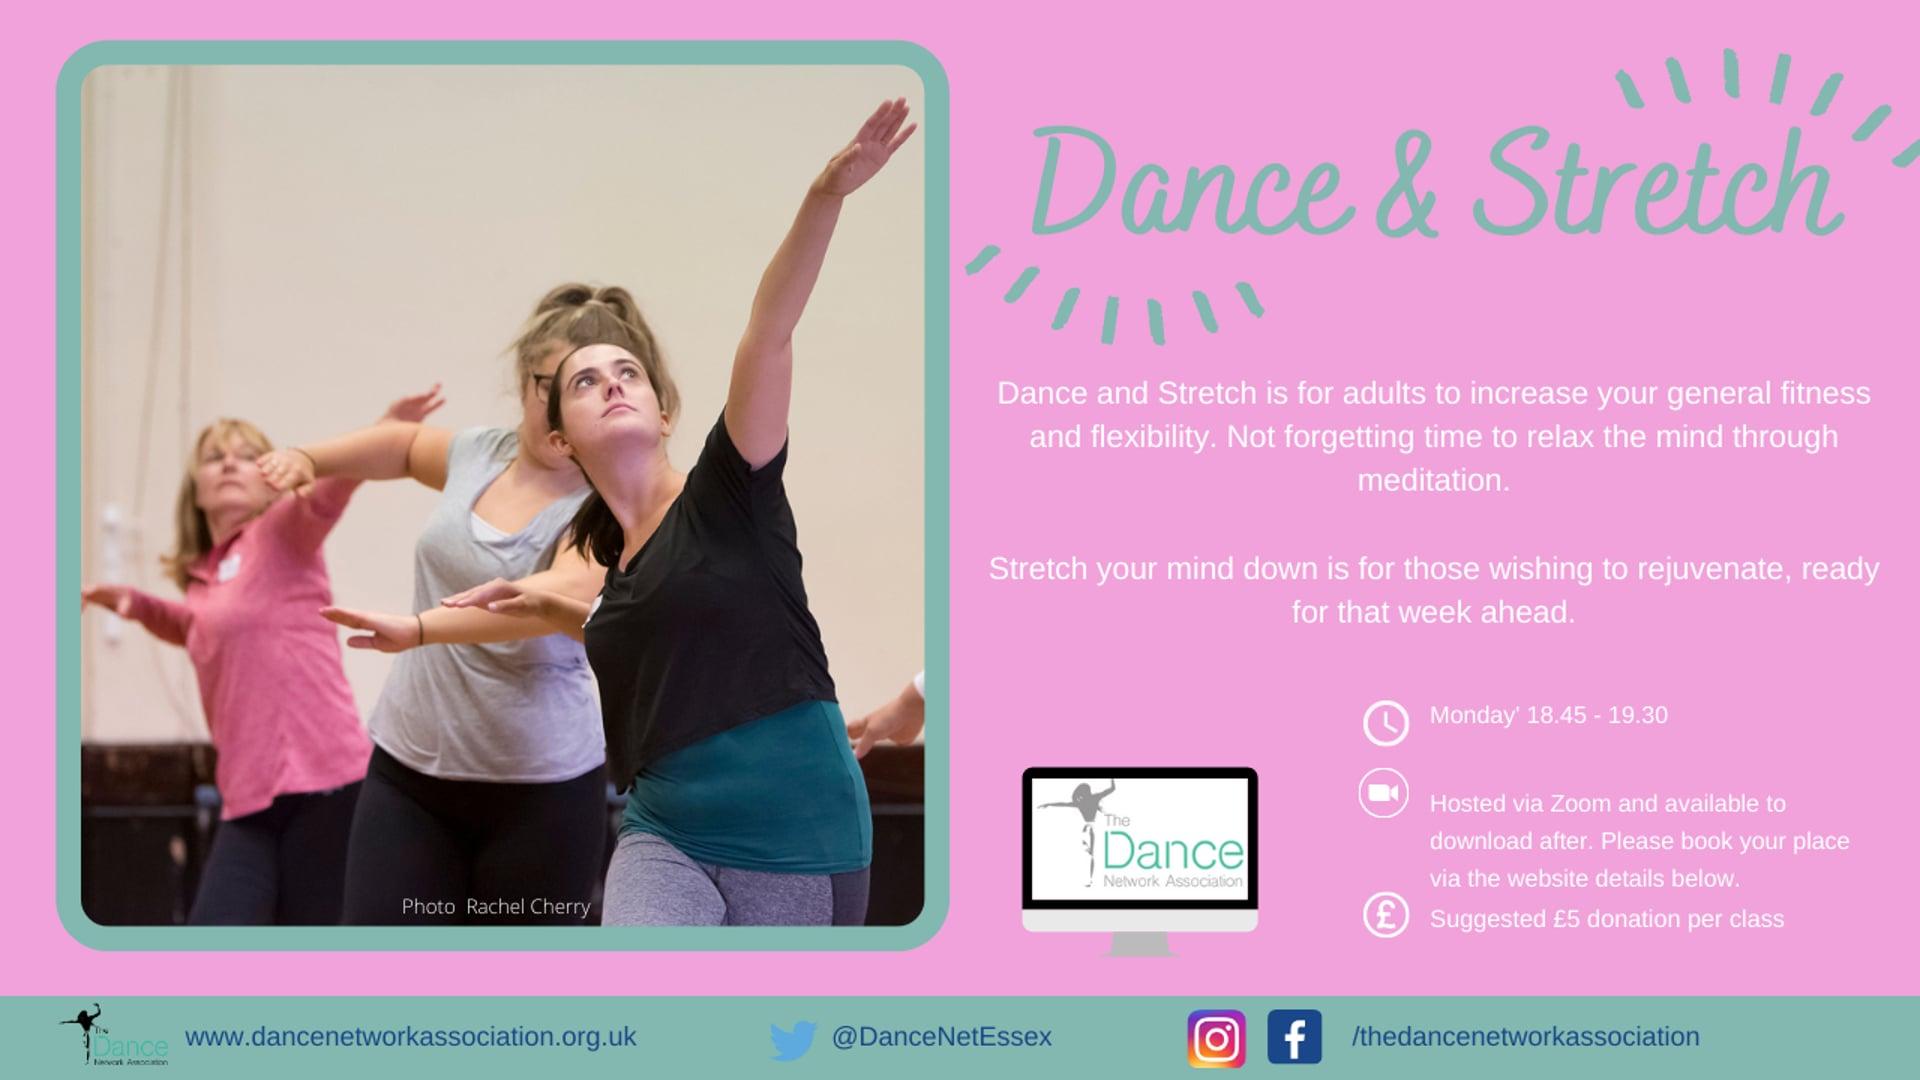 Dance & Stretch February 2021 B